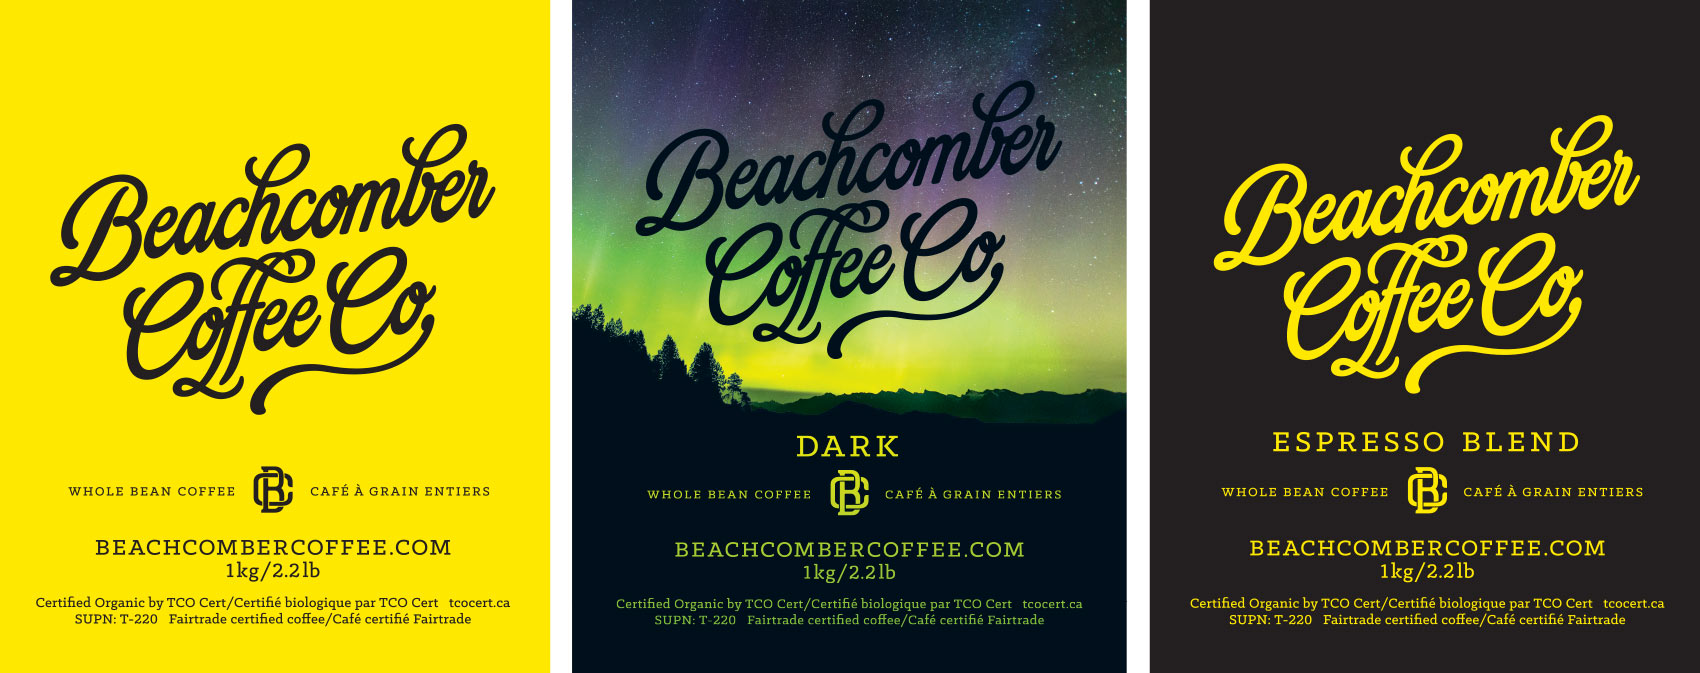 Beachcomber_coffee_bag_art.jpg